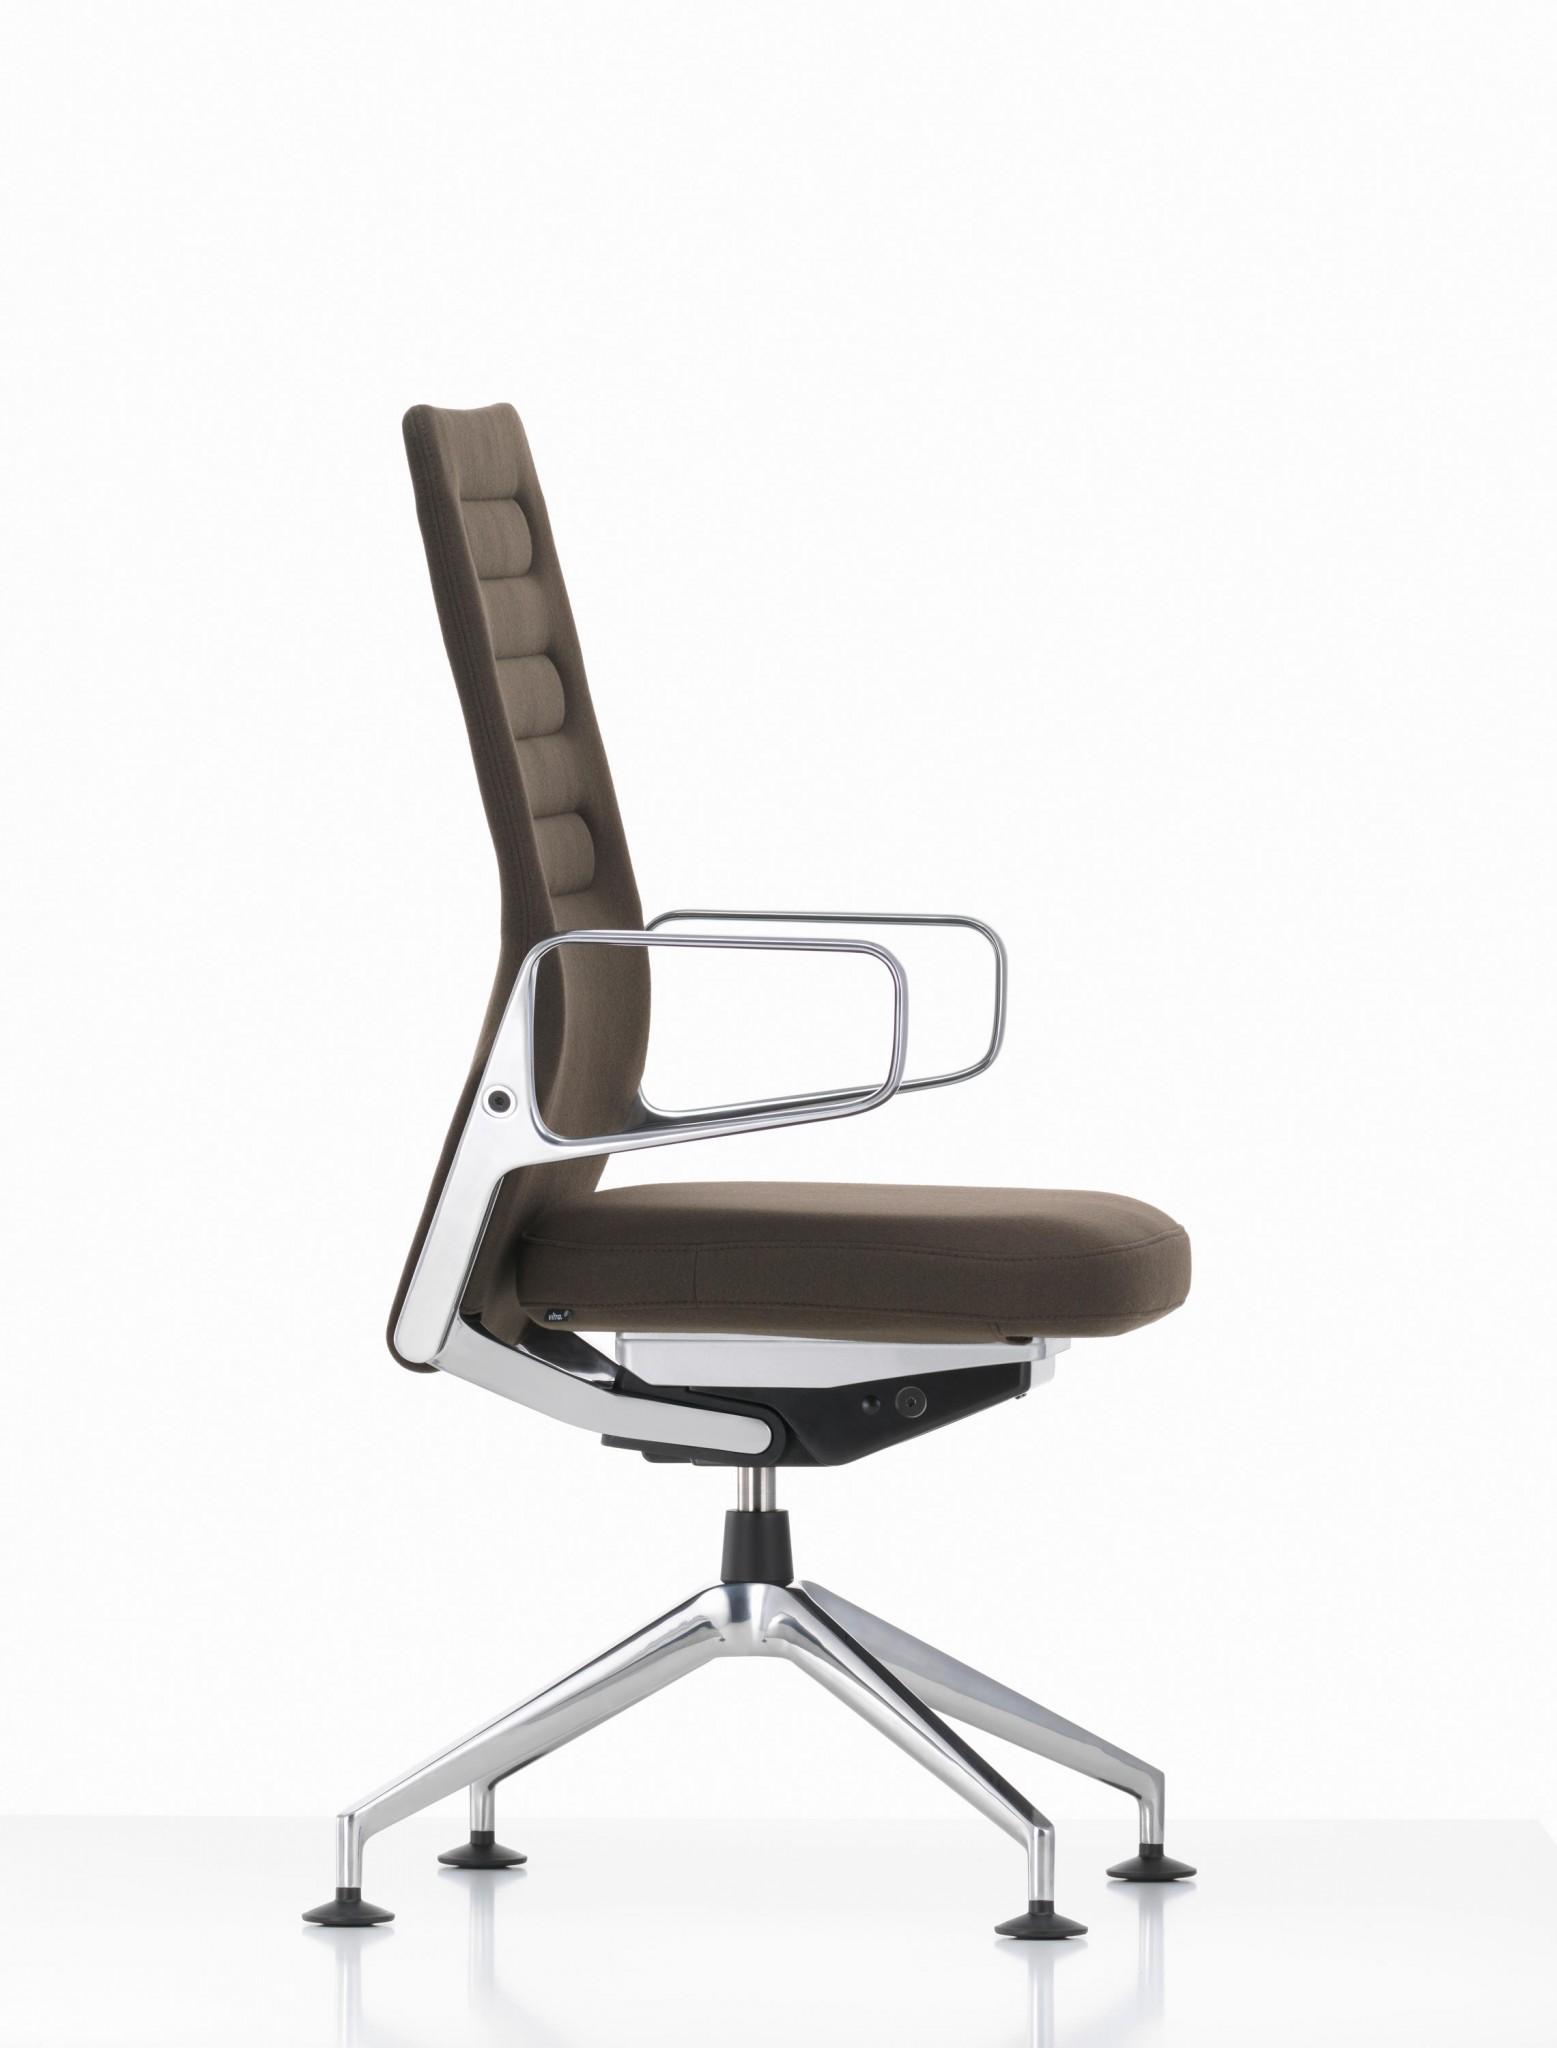 Squarcina vitra ac4 chair squarcina for Sedie vitra ufficio